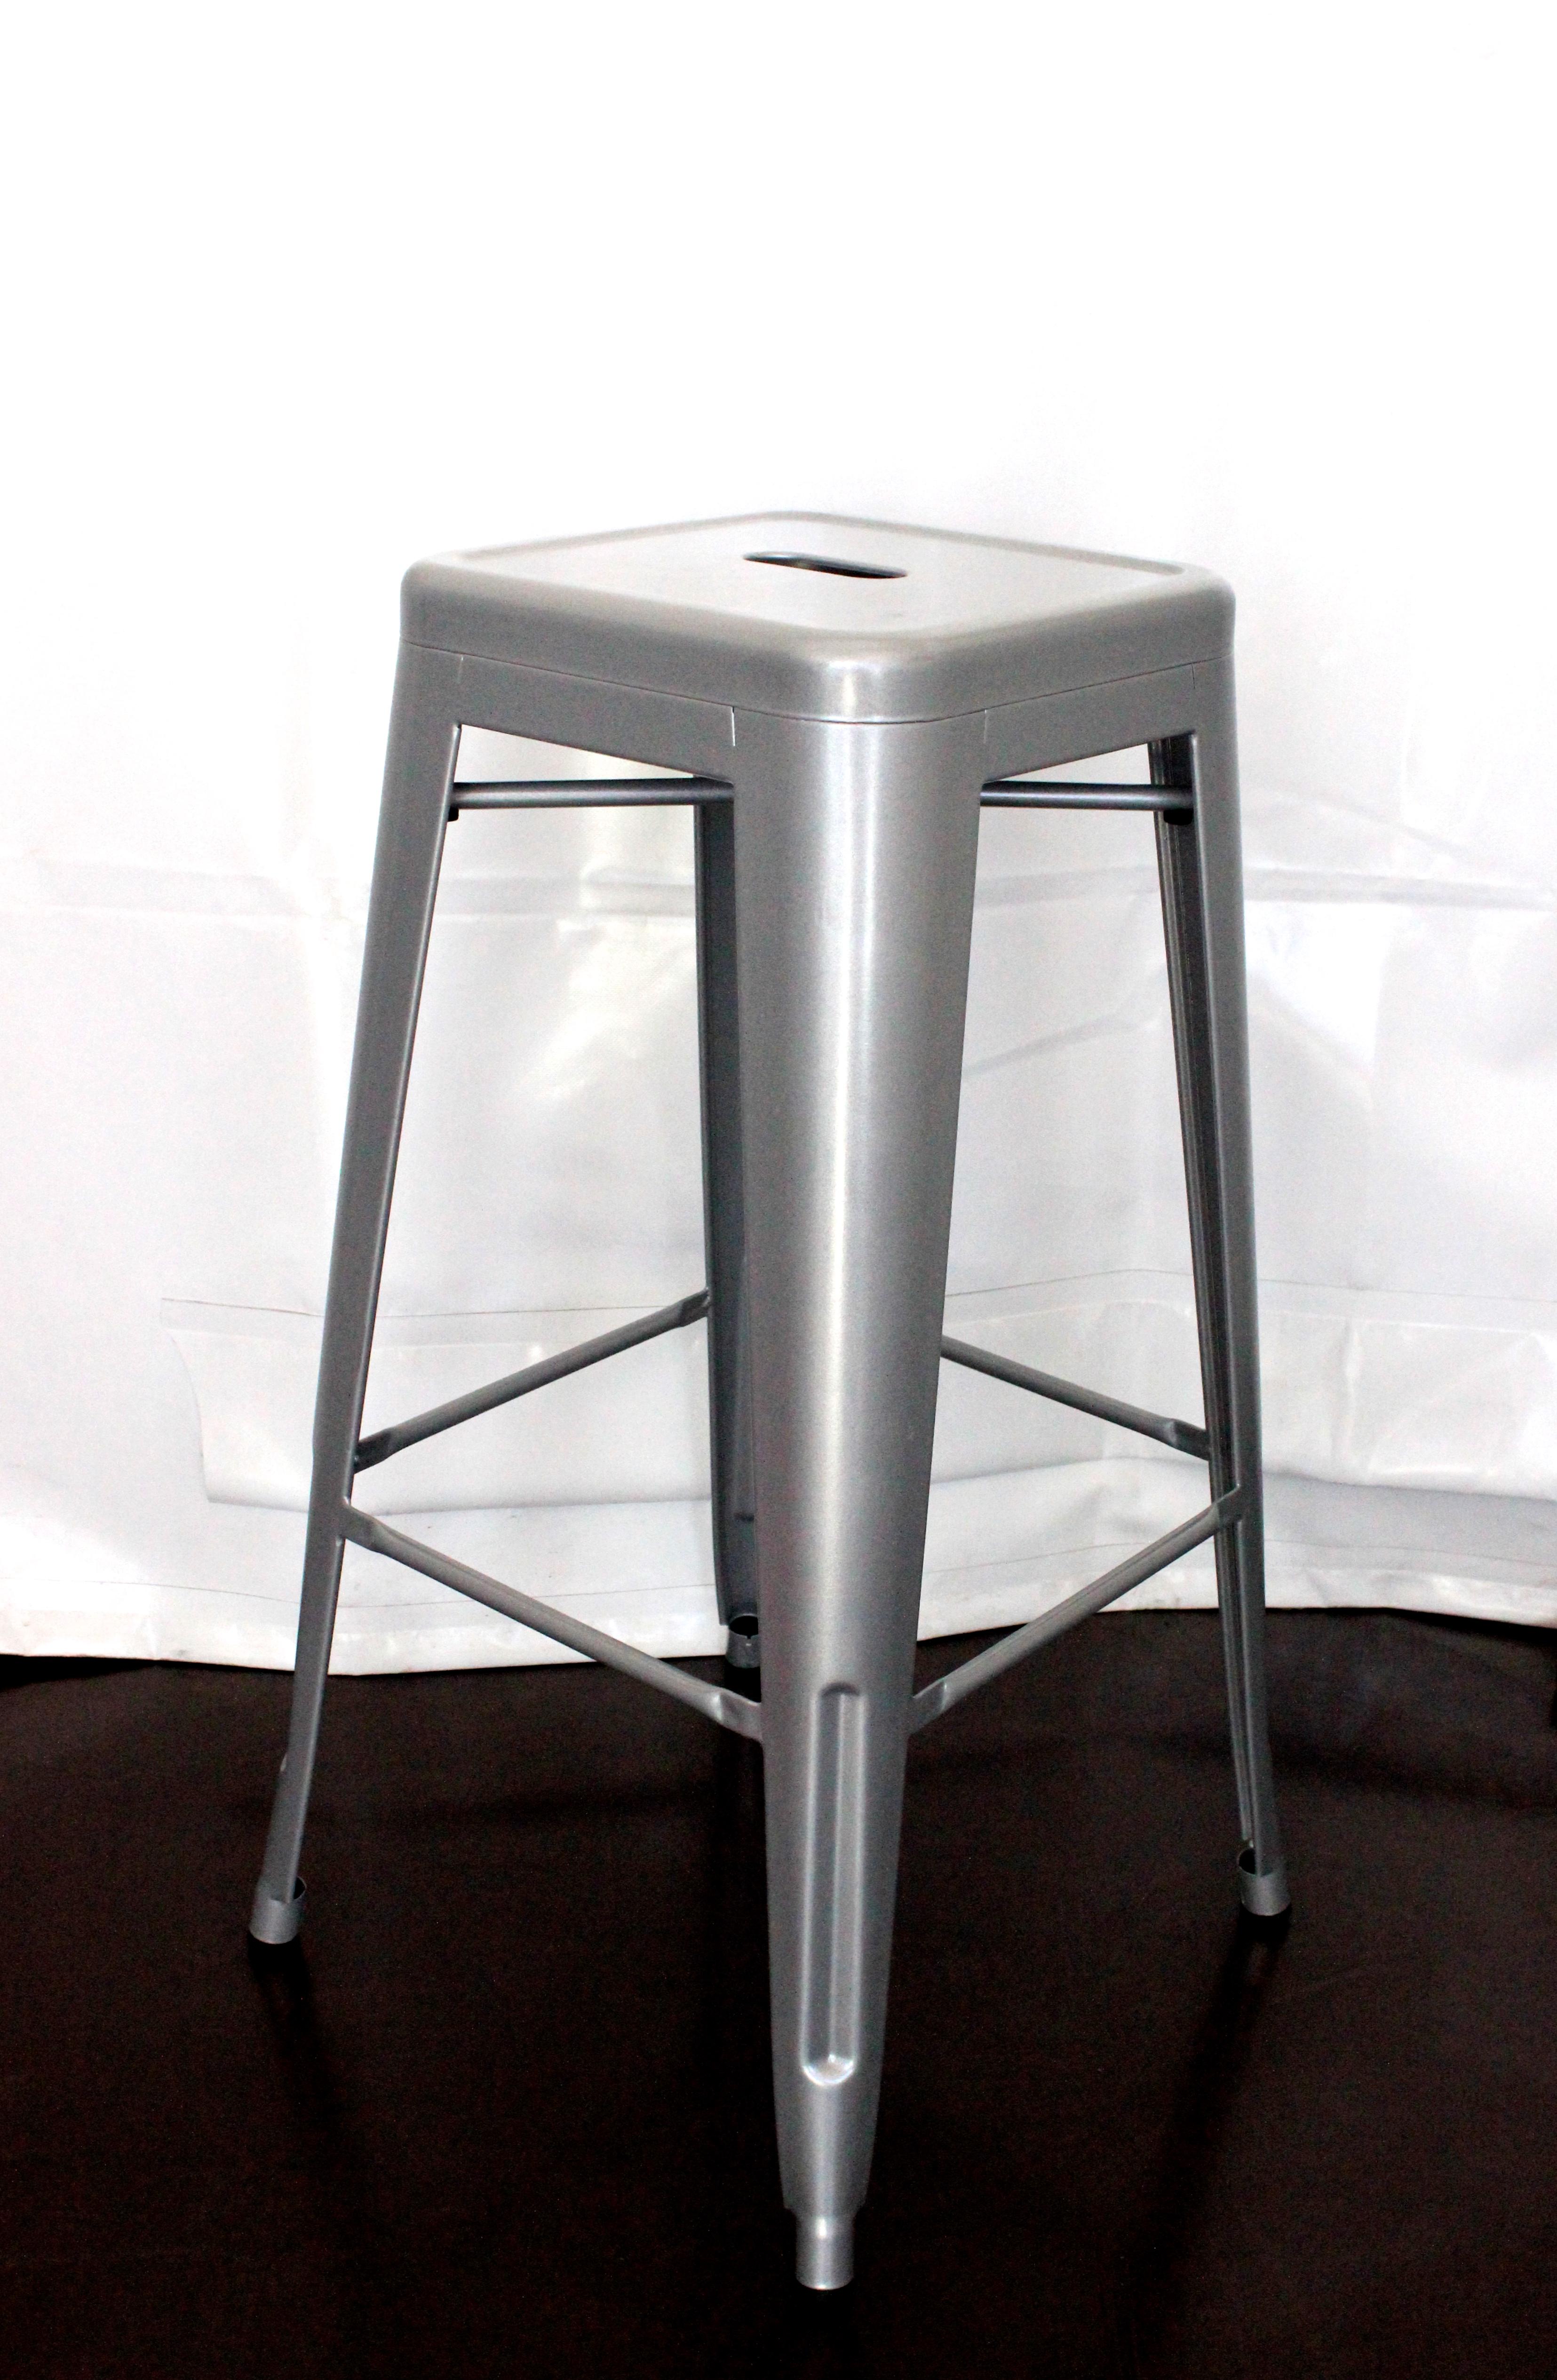 Tolix bar stools - silver, 76cm tall